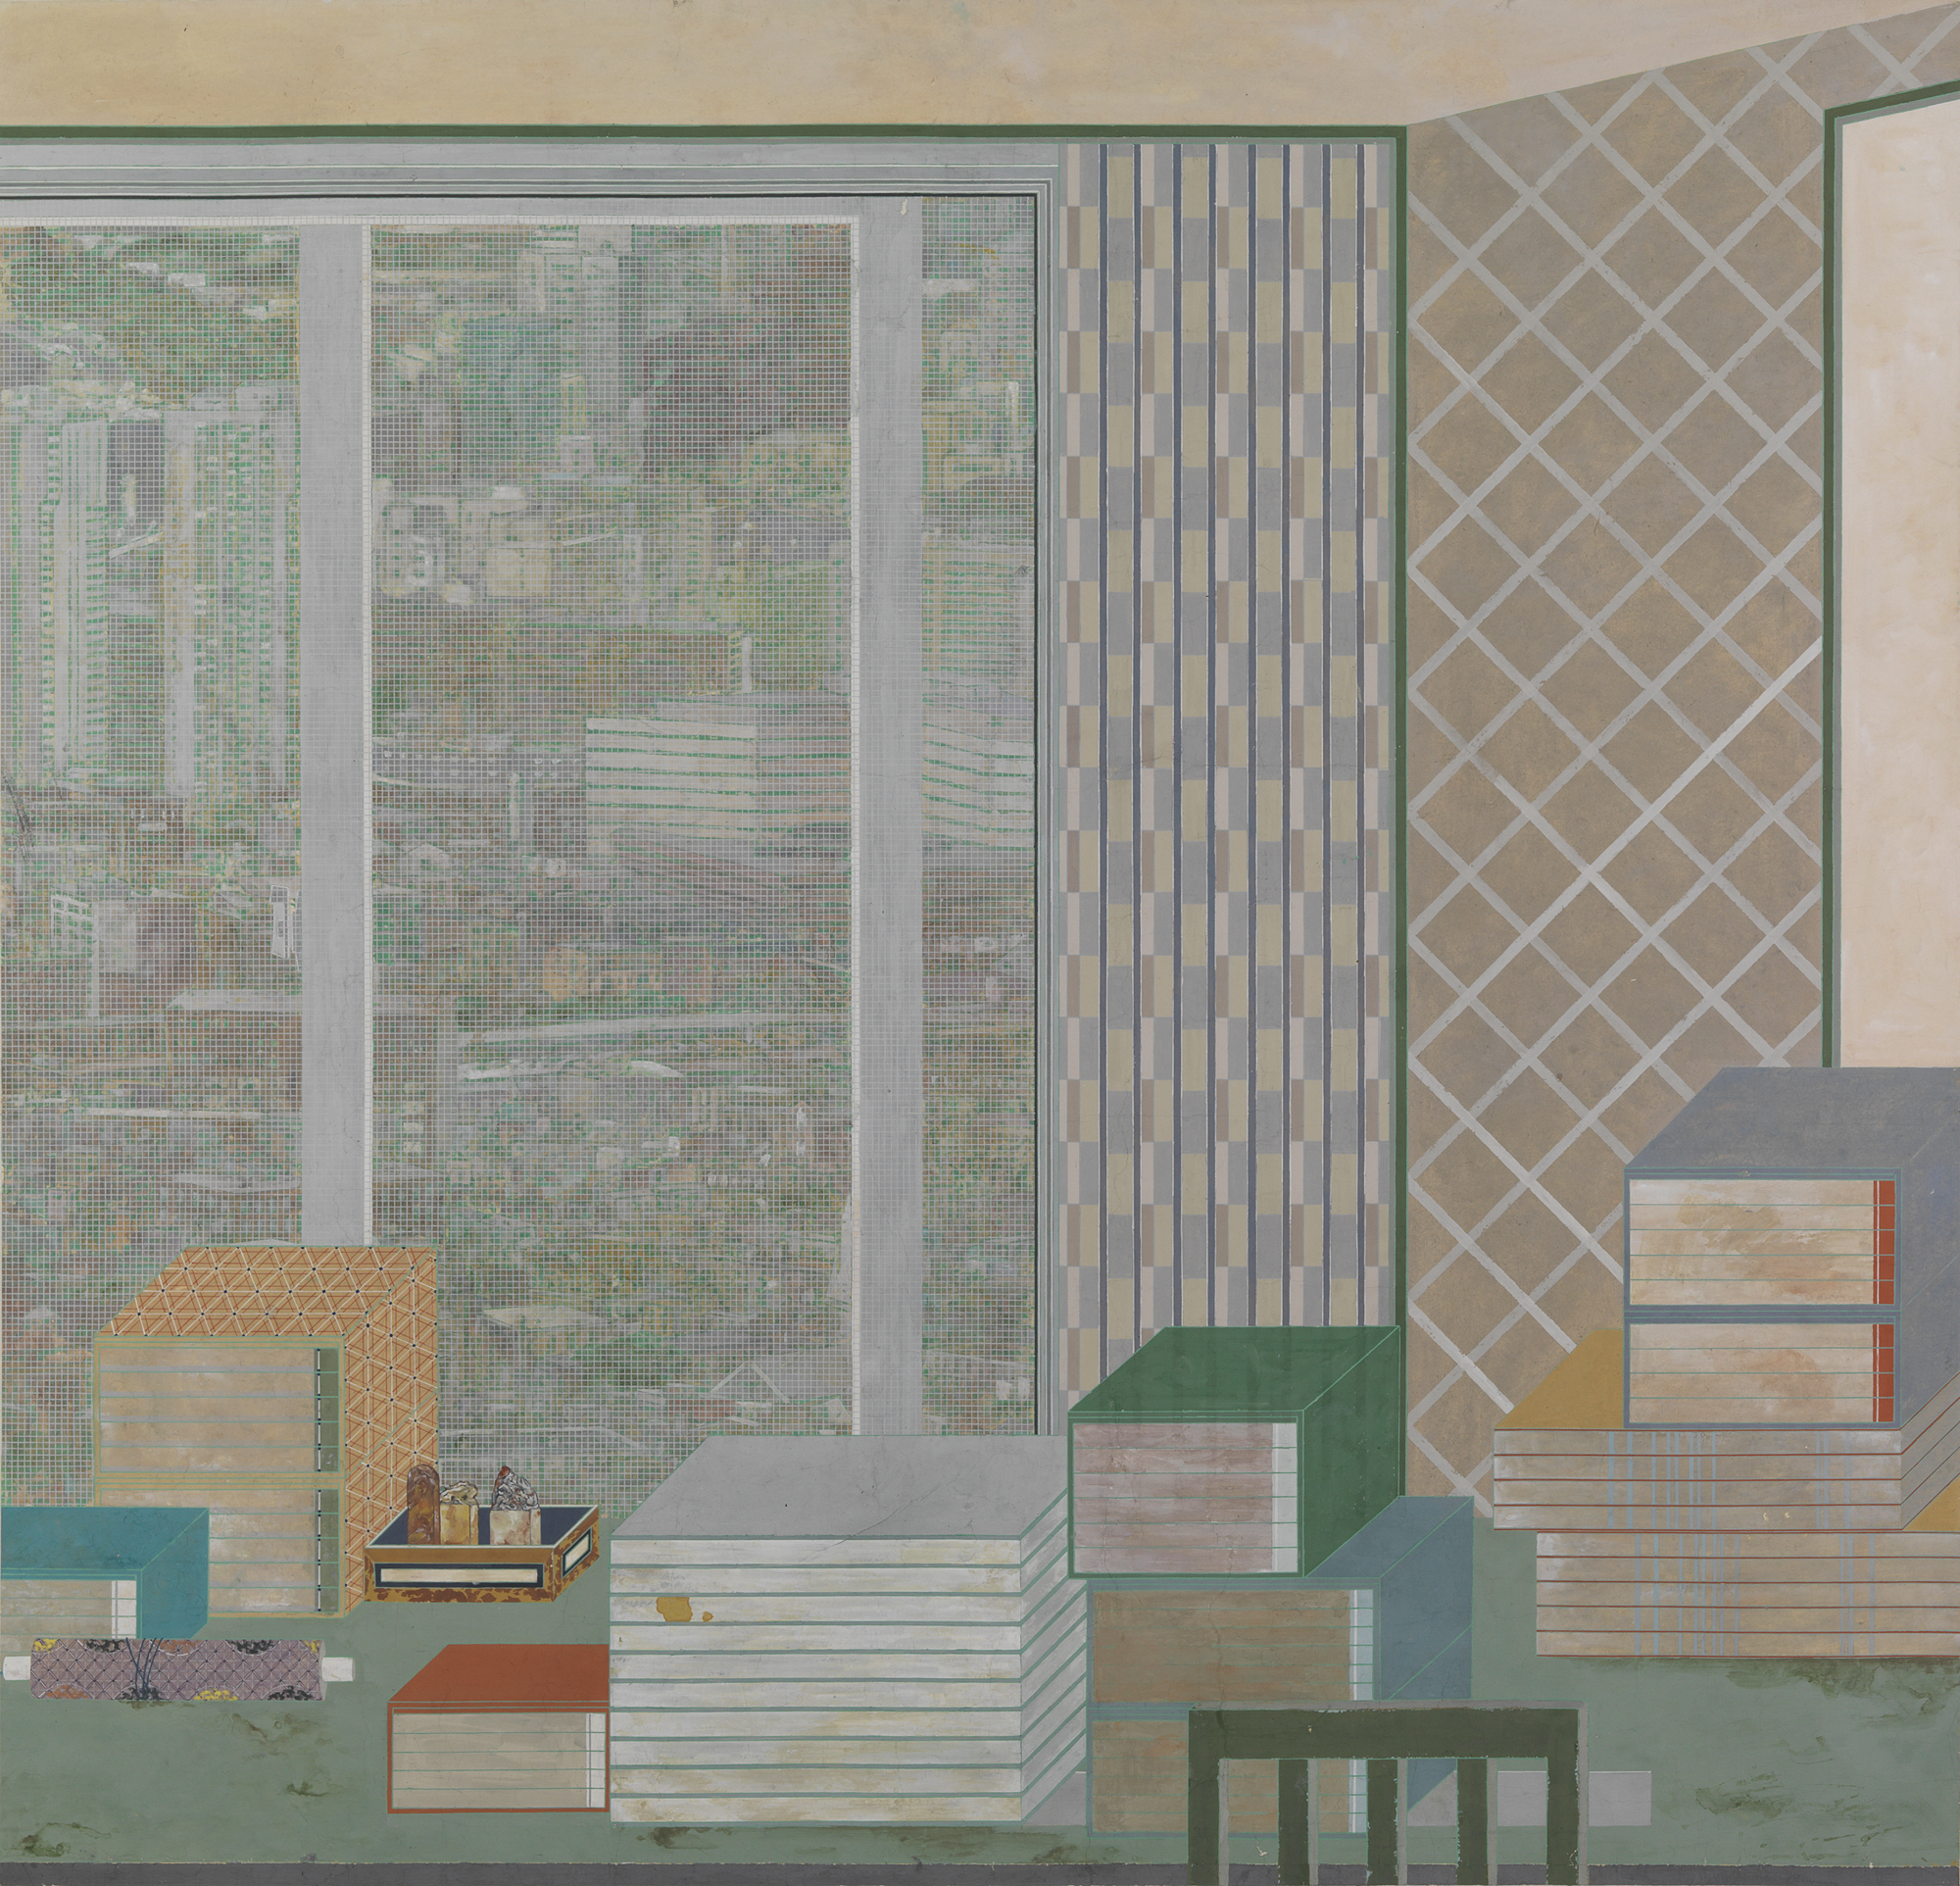 Peng Jian 彭剑, Empty Room 空房间, 2013, Color on paper 纸本设色, 158 x 152 cm